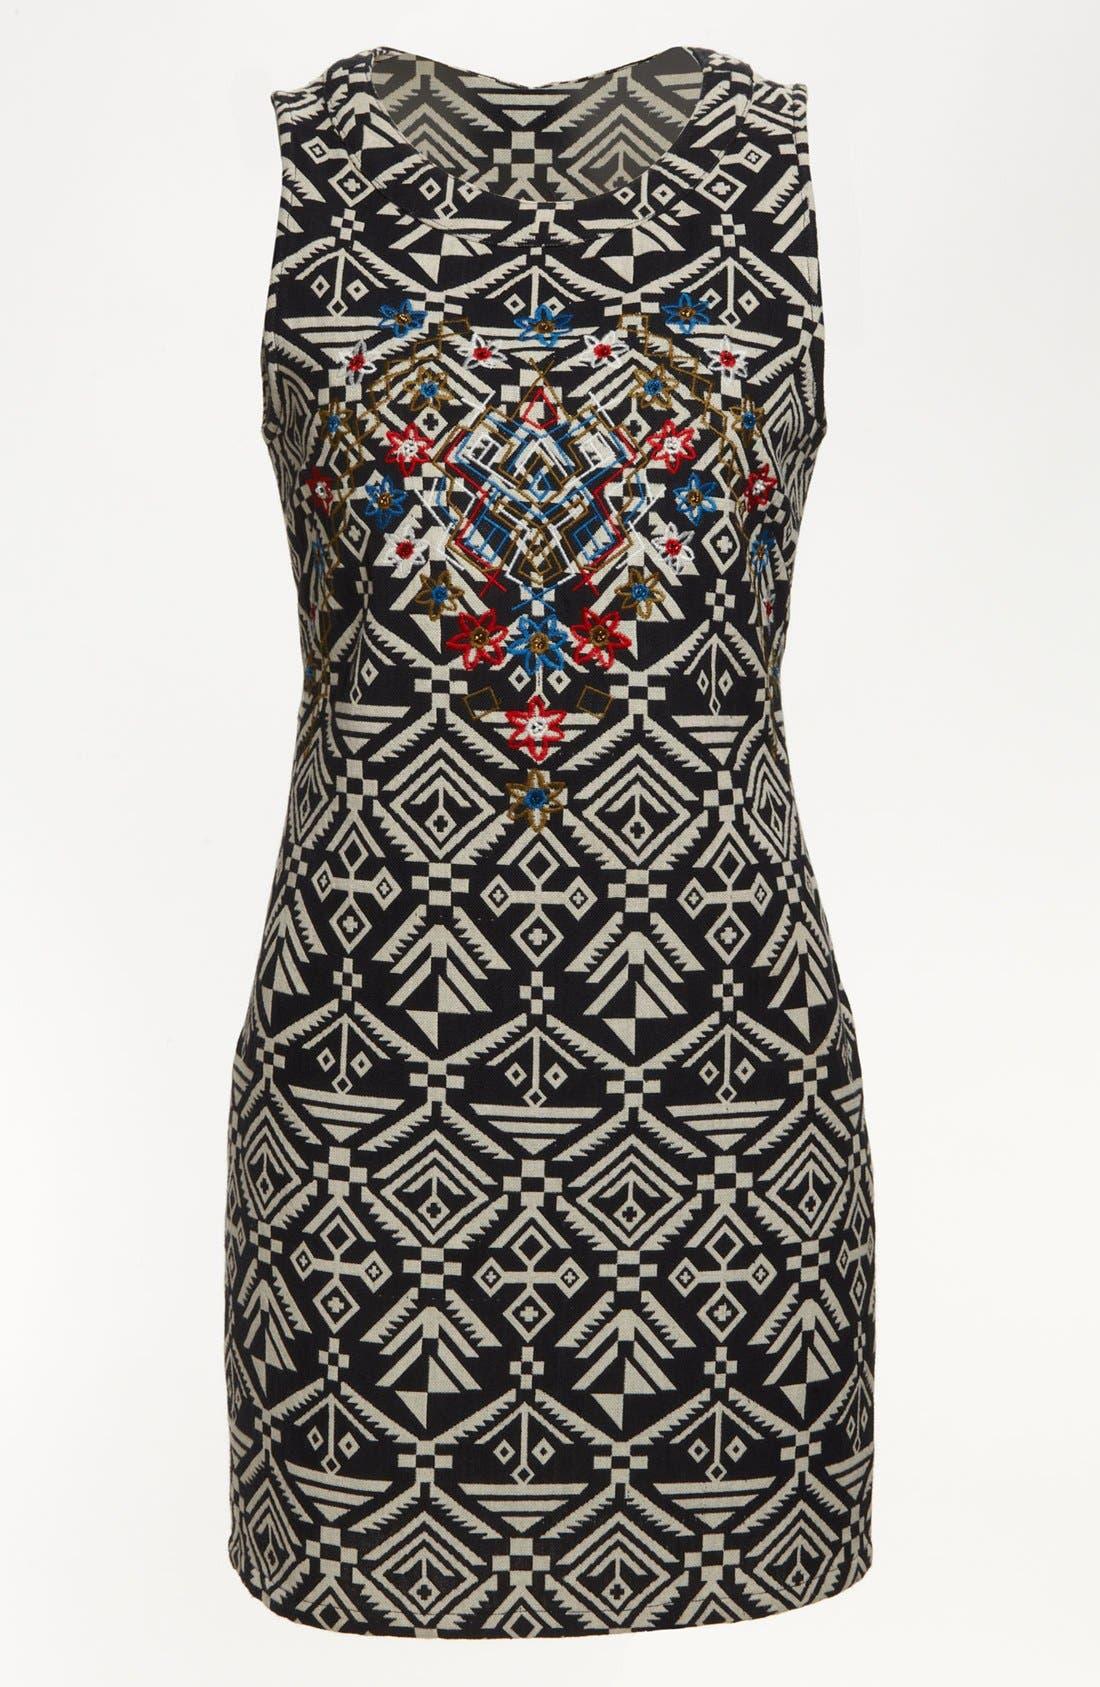 Alternate Image 1 Selected - ASTR Tribal Print Body-Con Dress